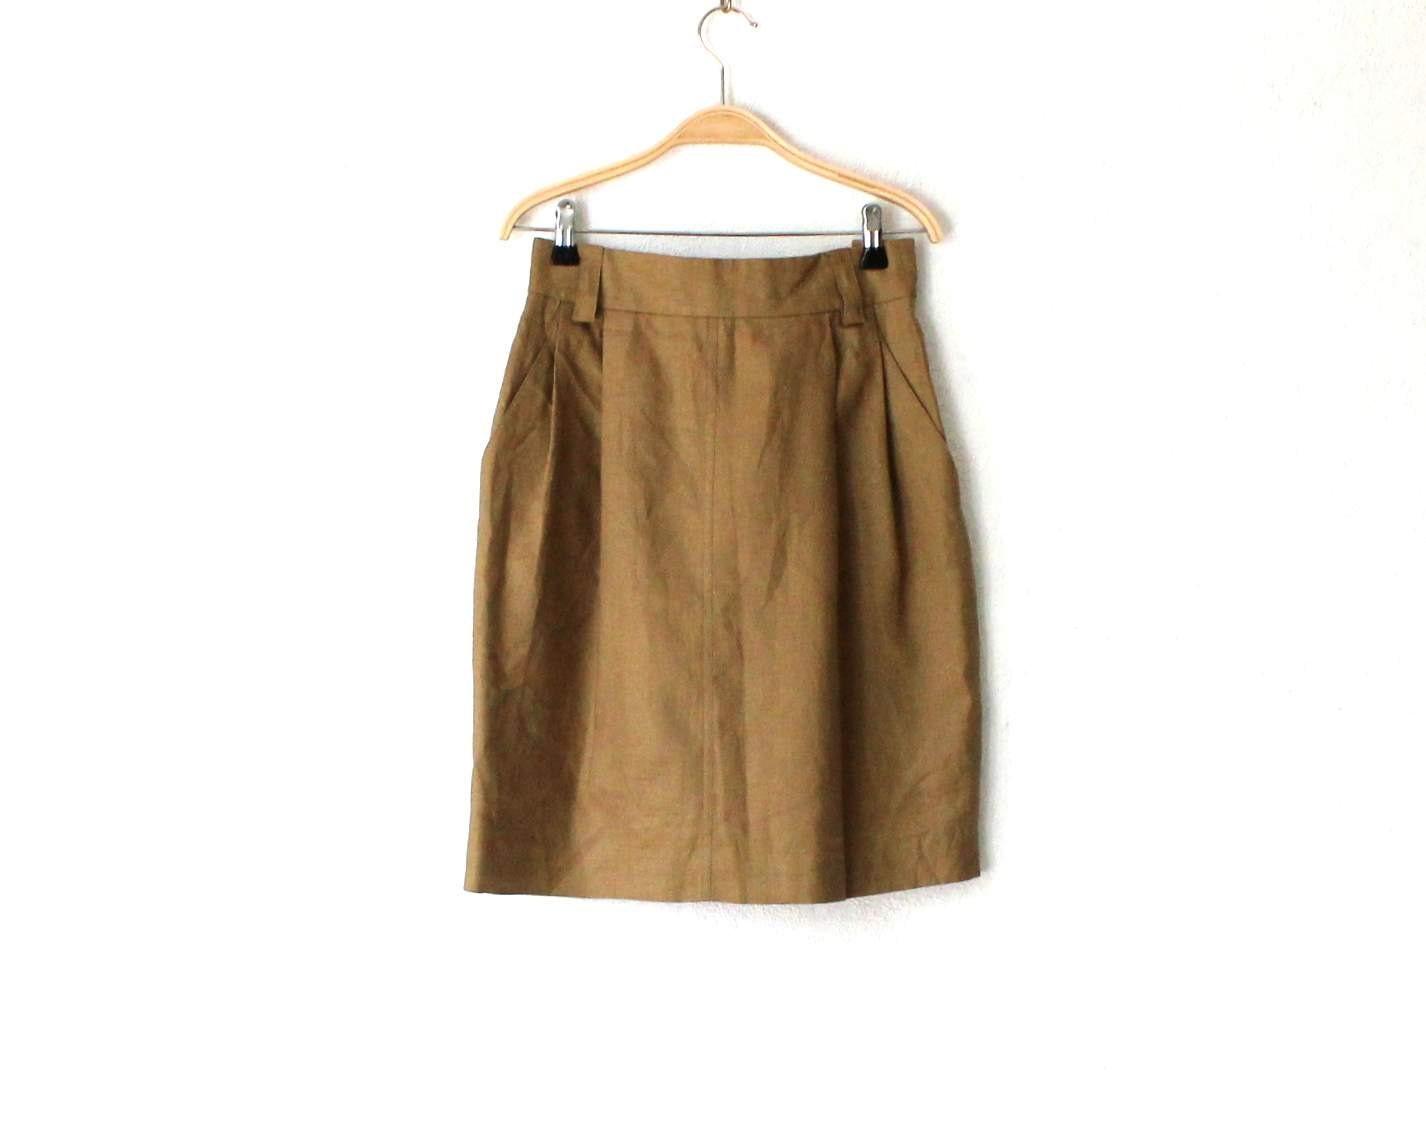 khaki brown linen pencil skirt high waisted midi skirt